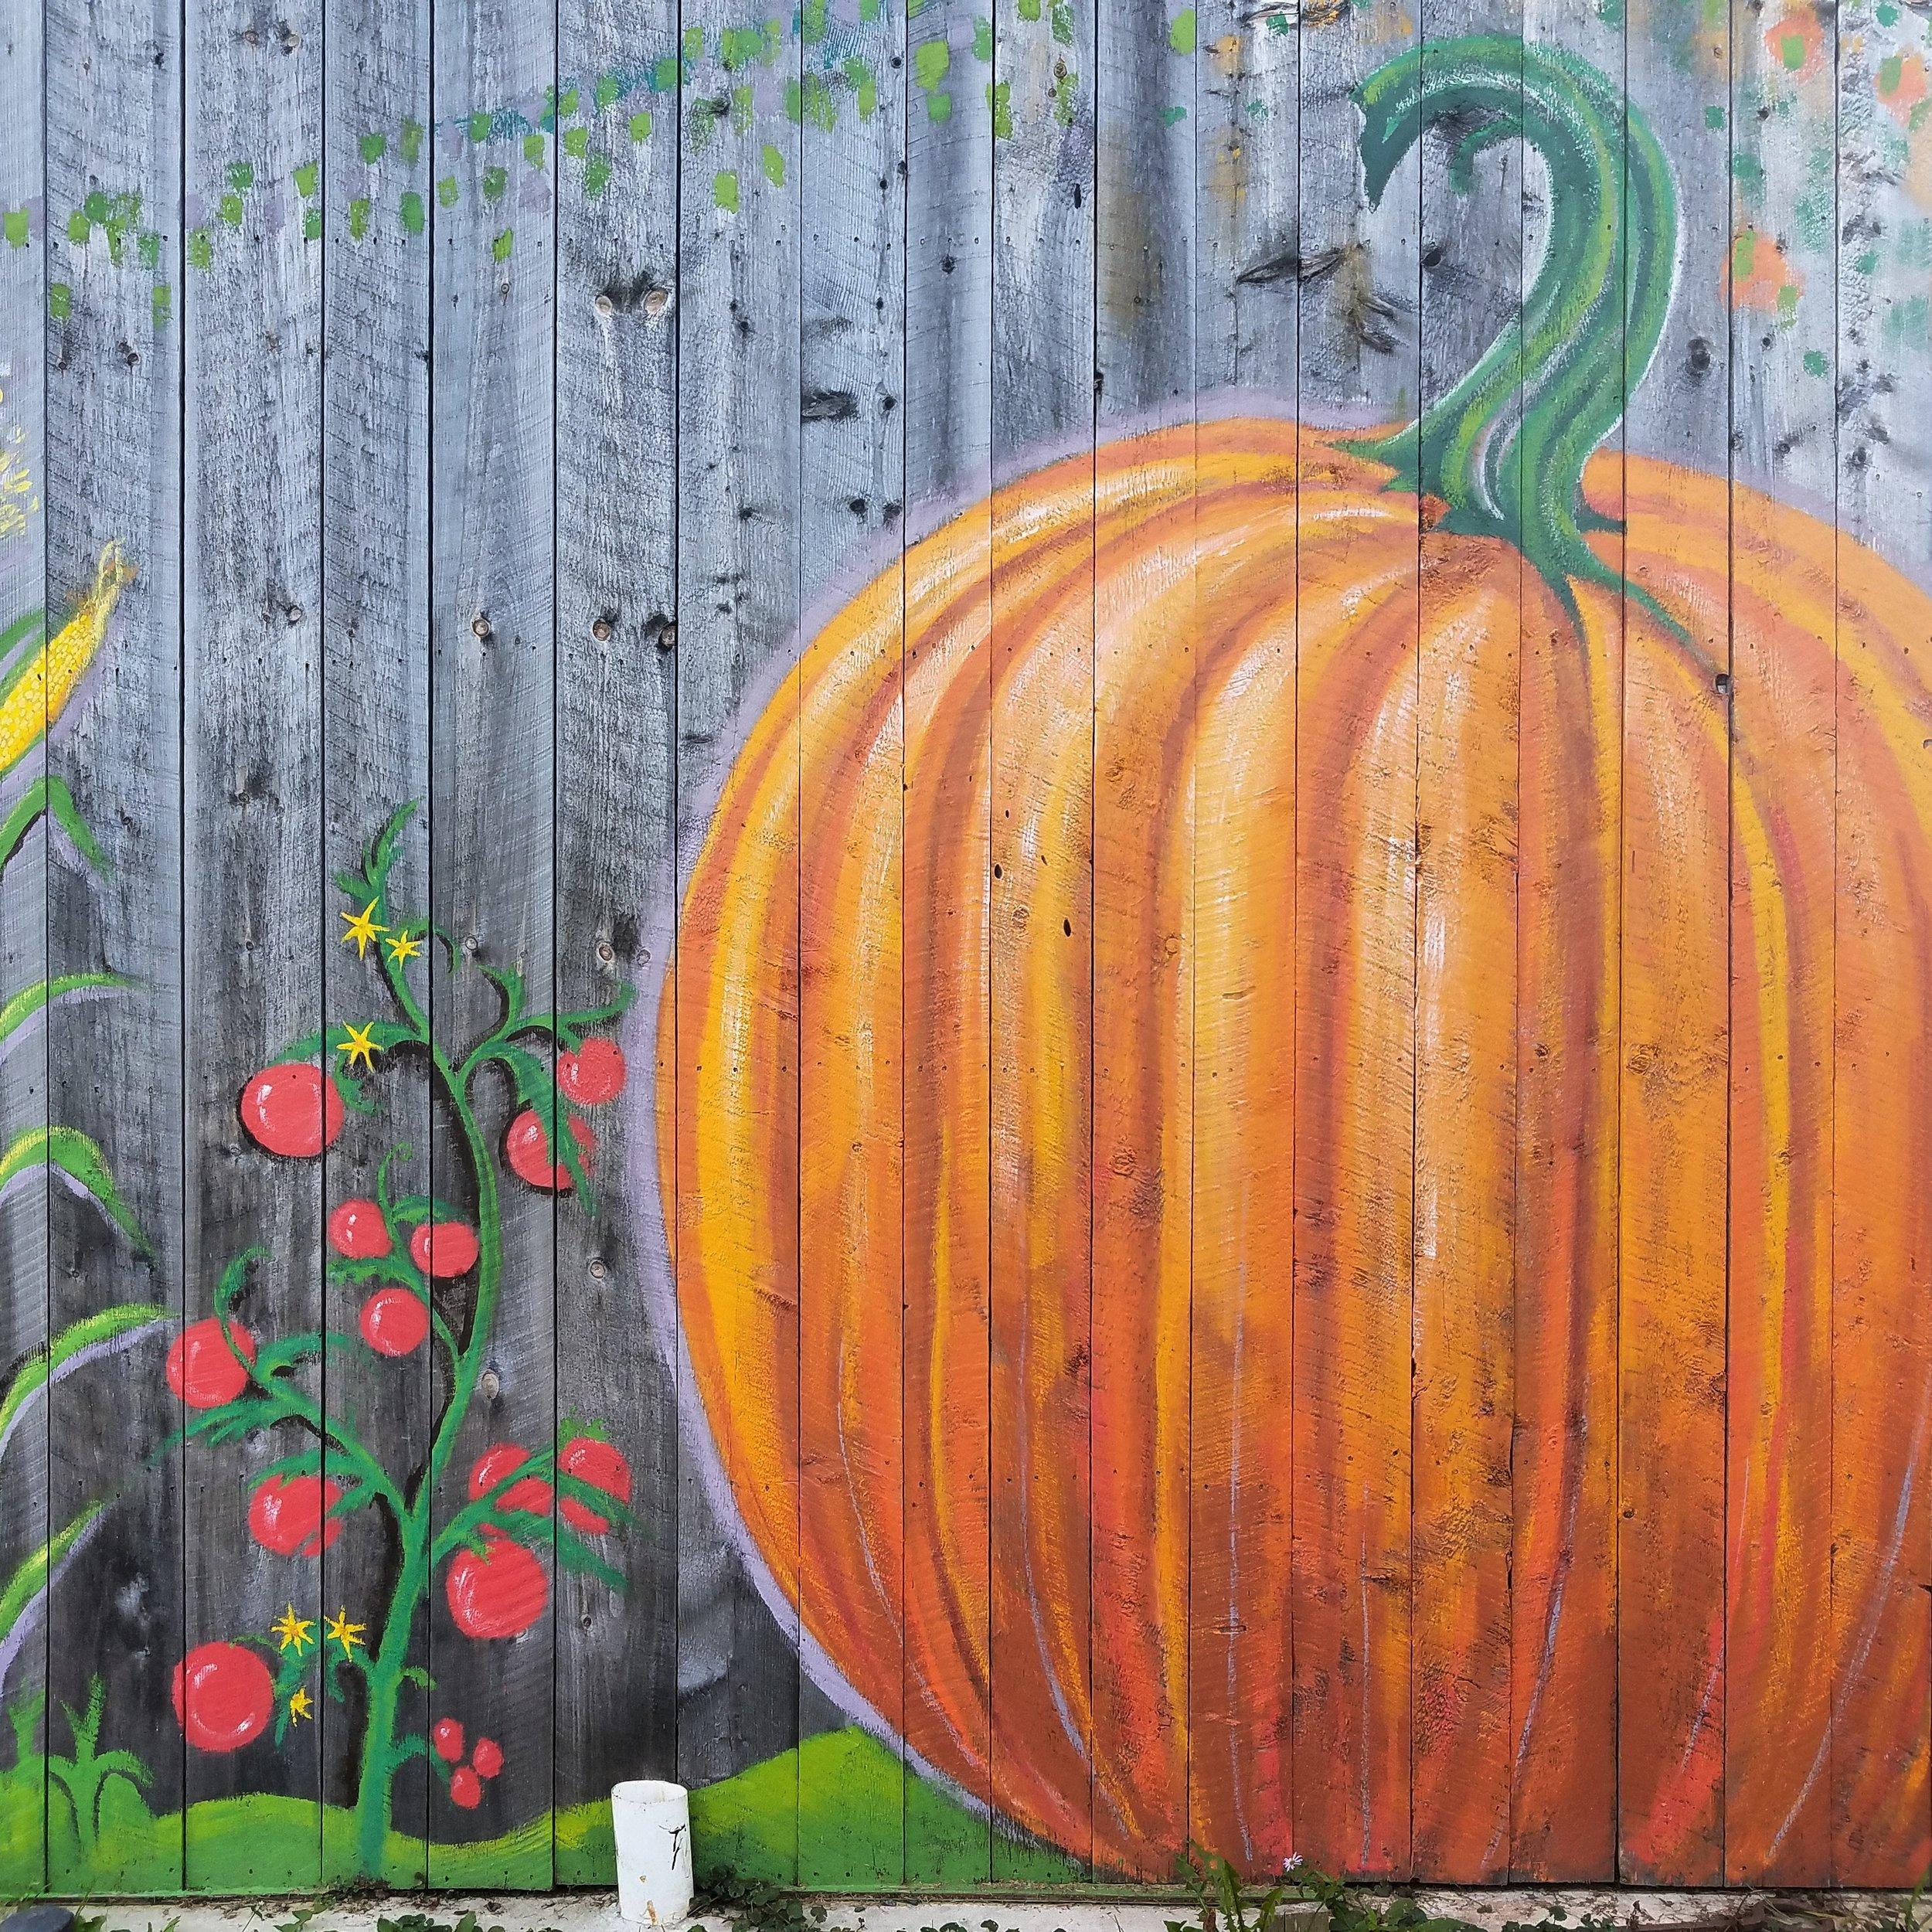 Pumpkins at Hartshorn Farm